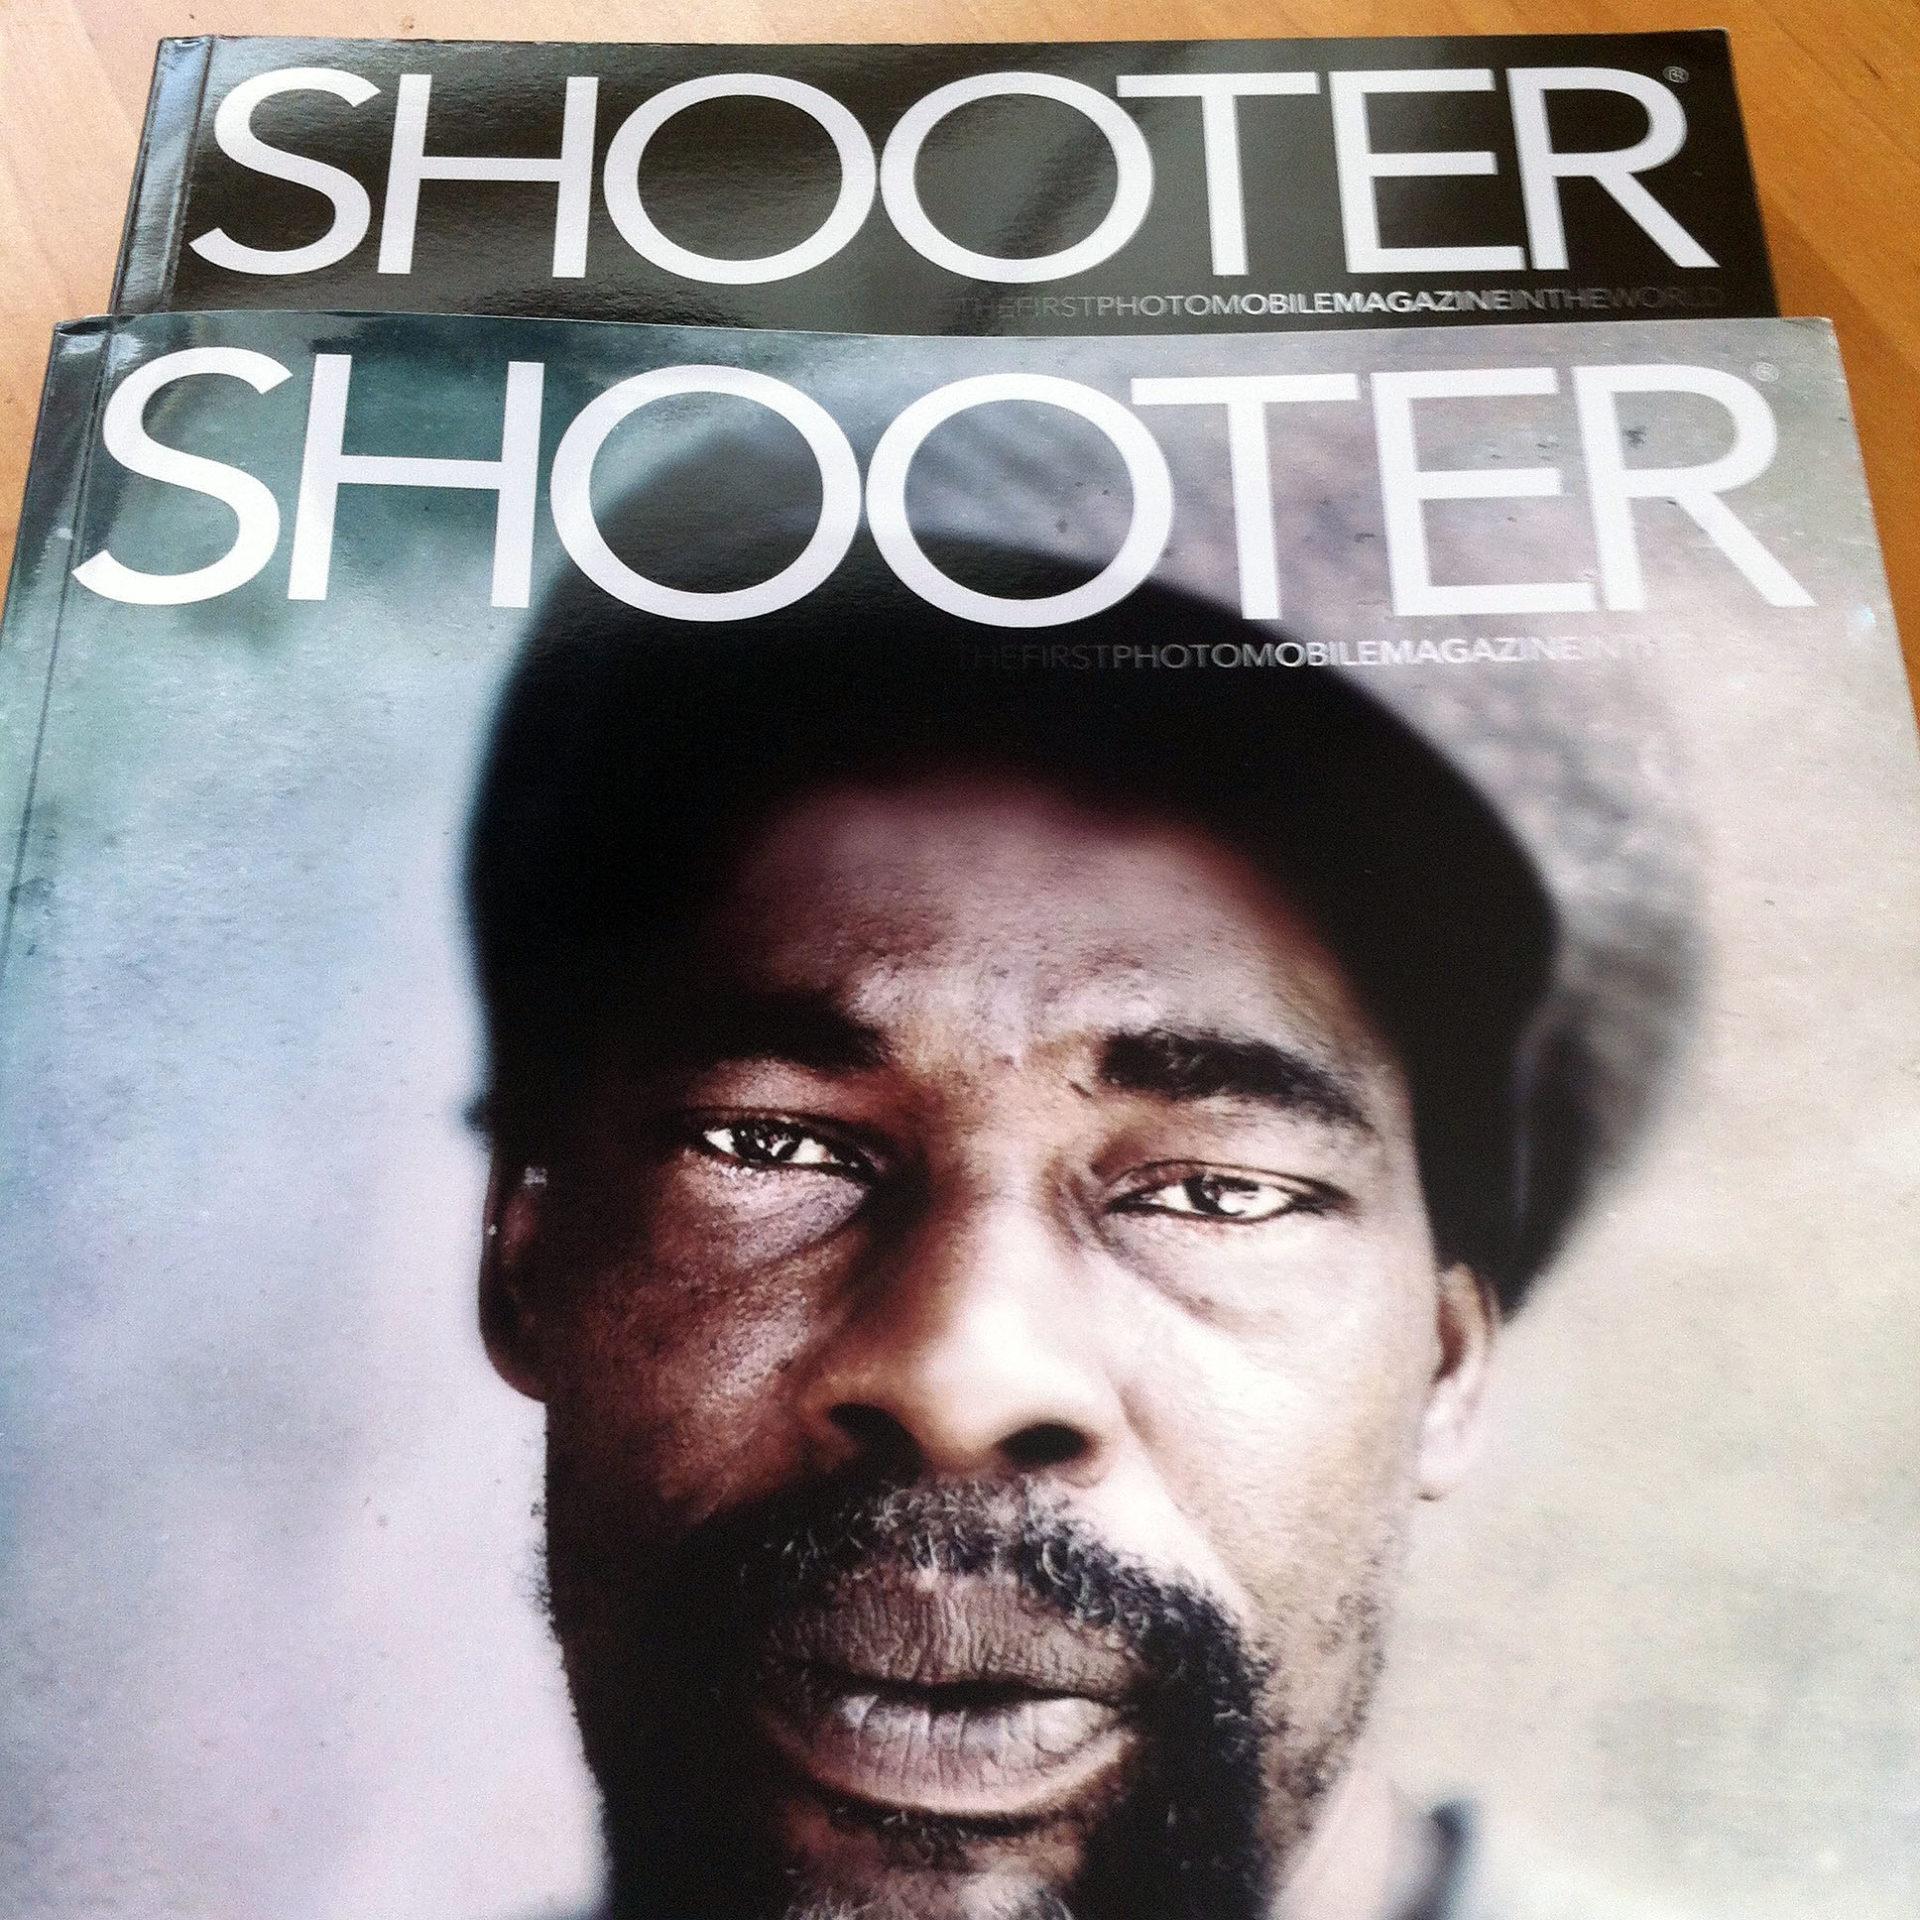 Shooter Magazine